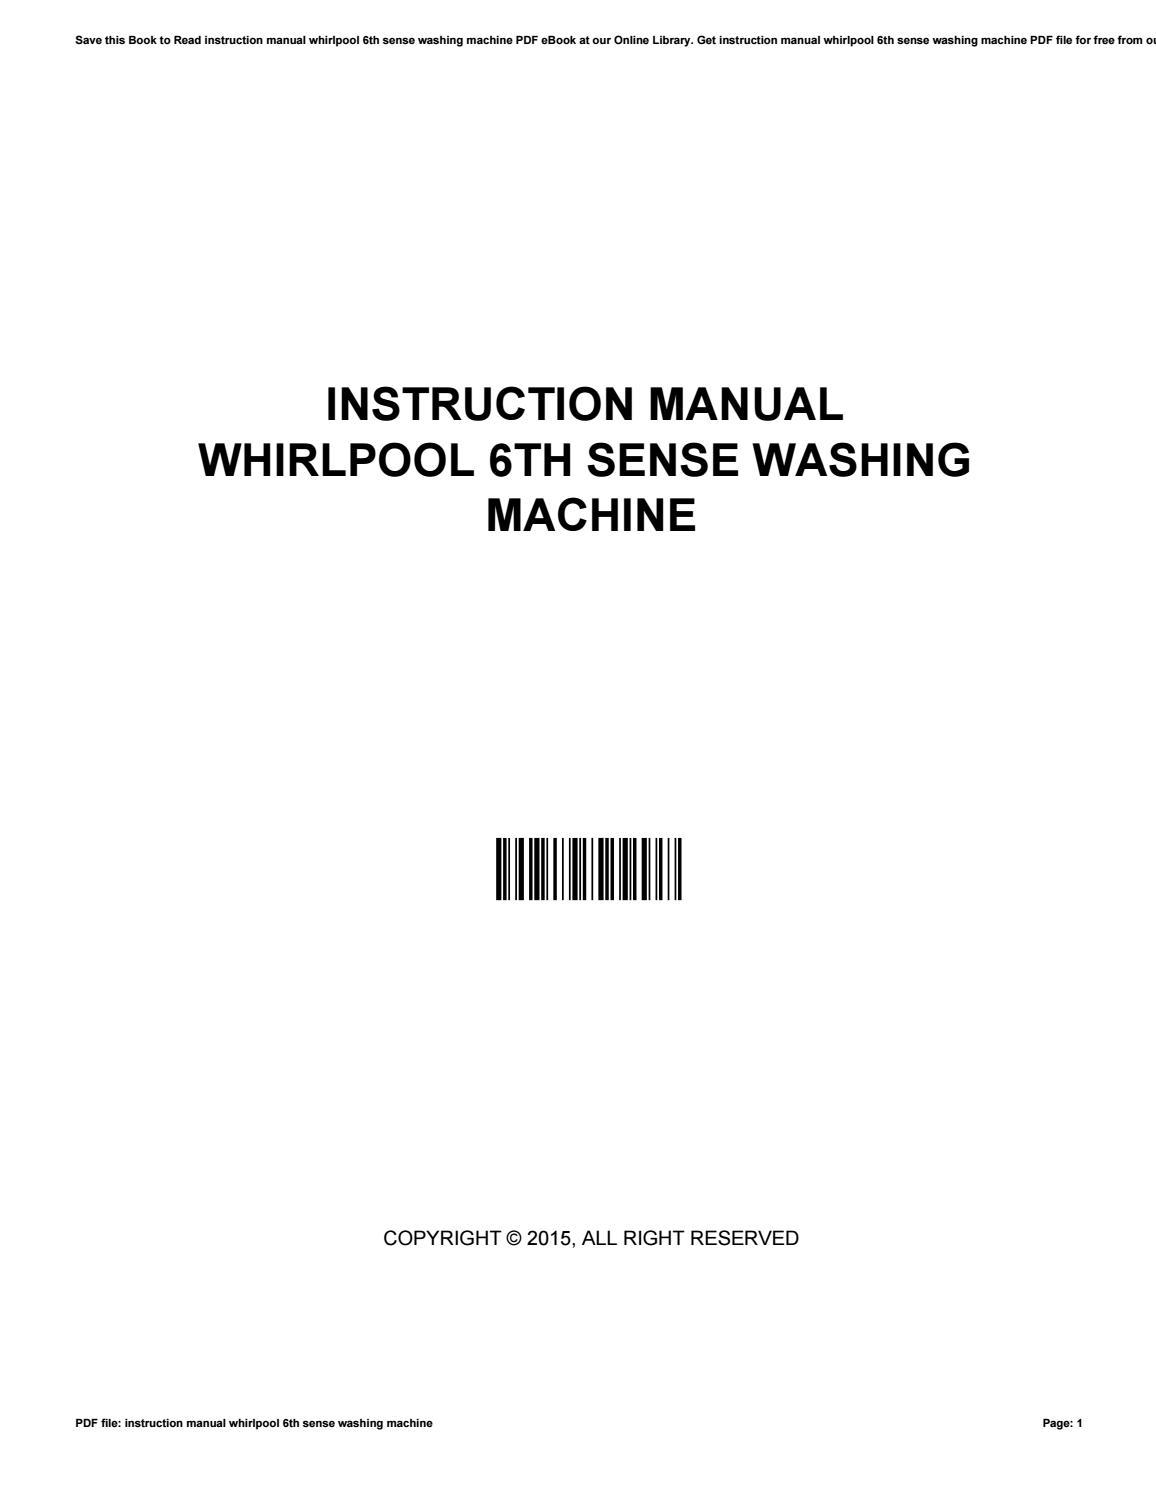 Instruction manual whirlpool 6th sense washing machine by AliciaBonds4506 -  issuu